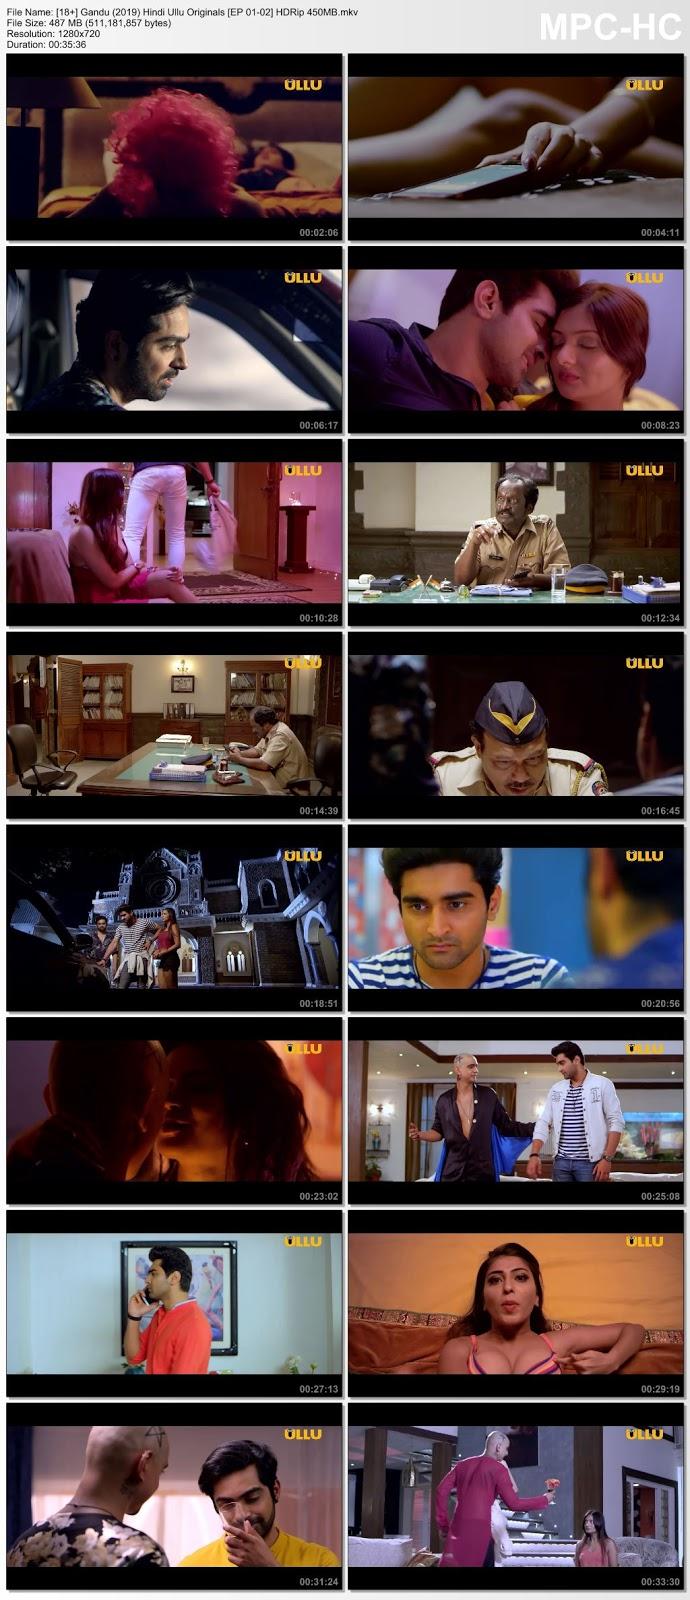 [18+] Gandu (2019) Hindi Ullu Originals [EP 01-02] HDRip 450MB Desirehub